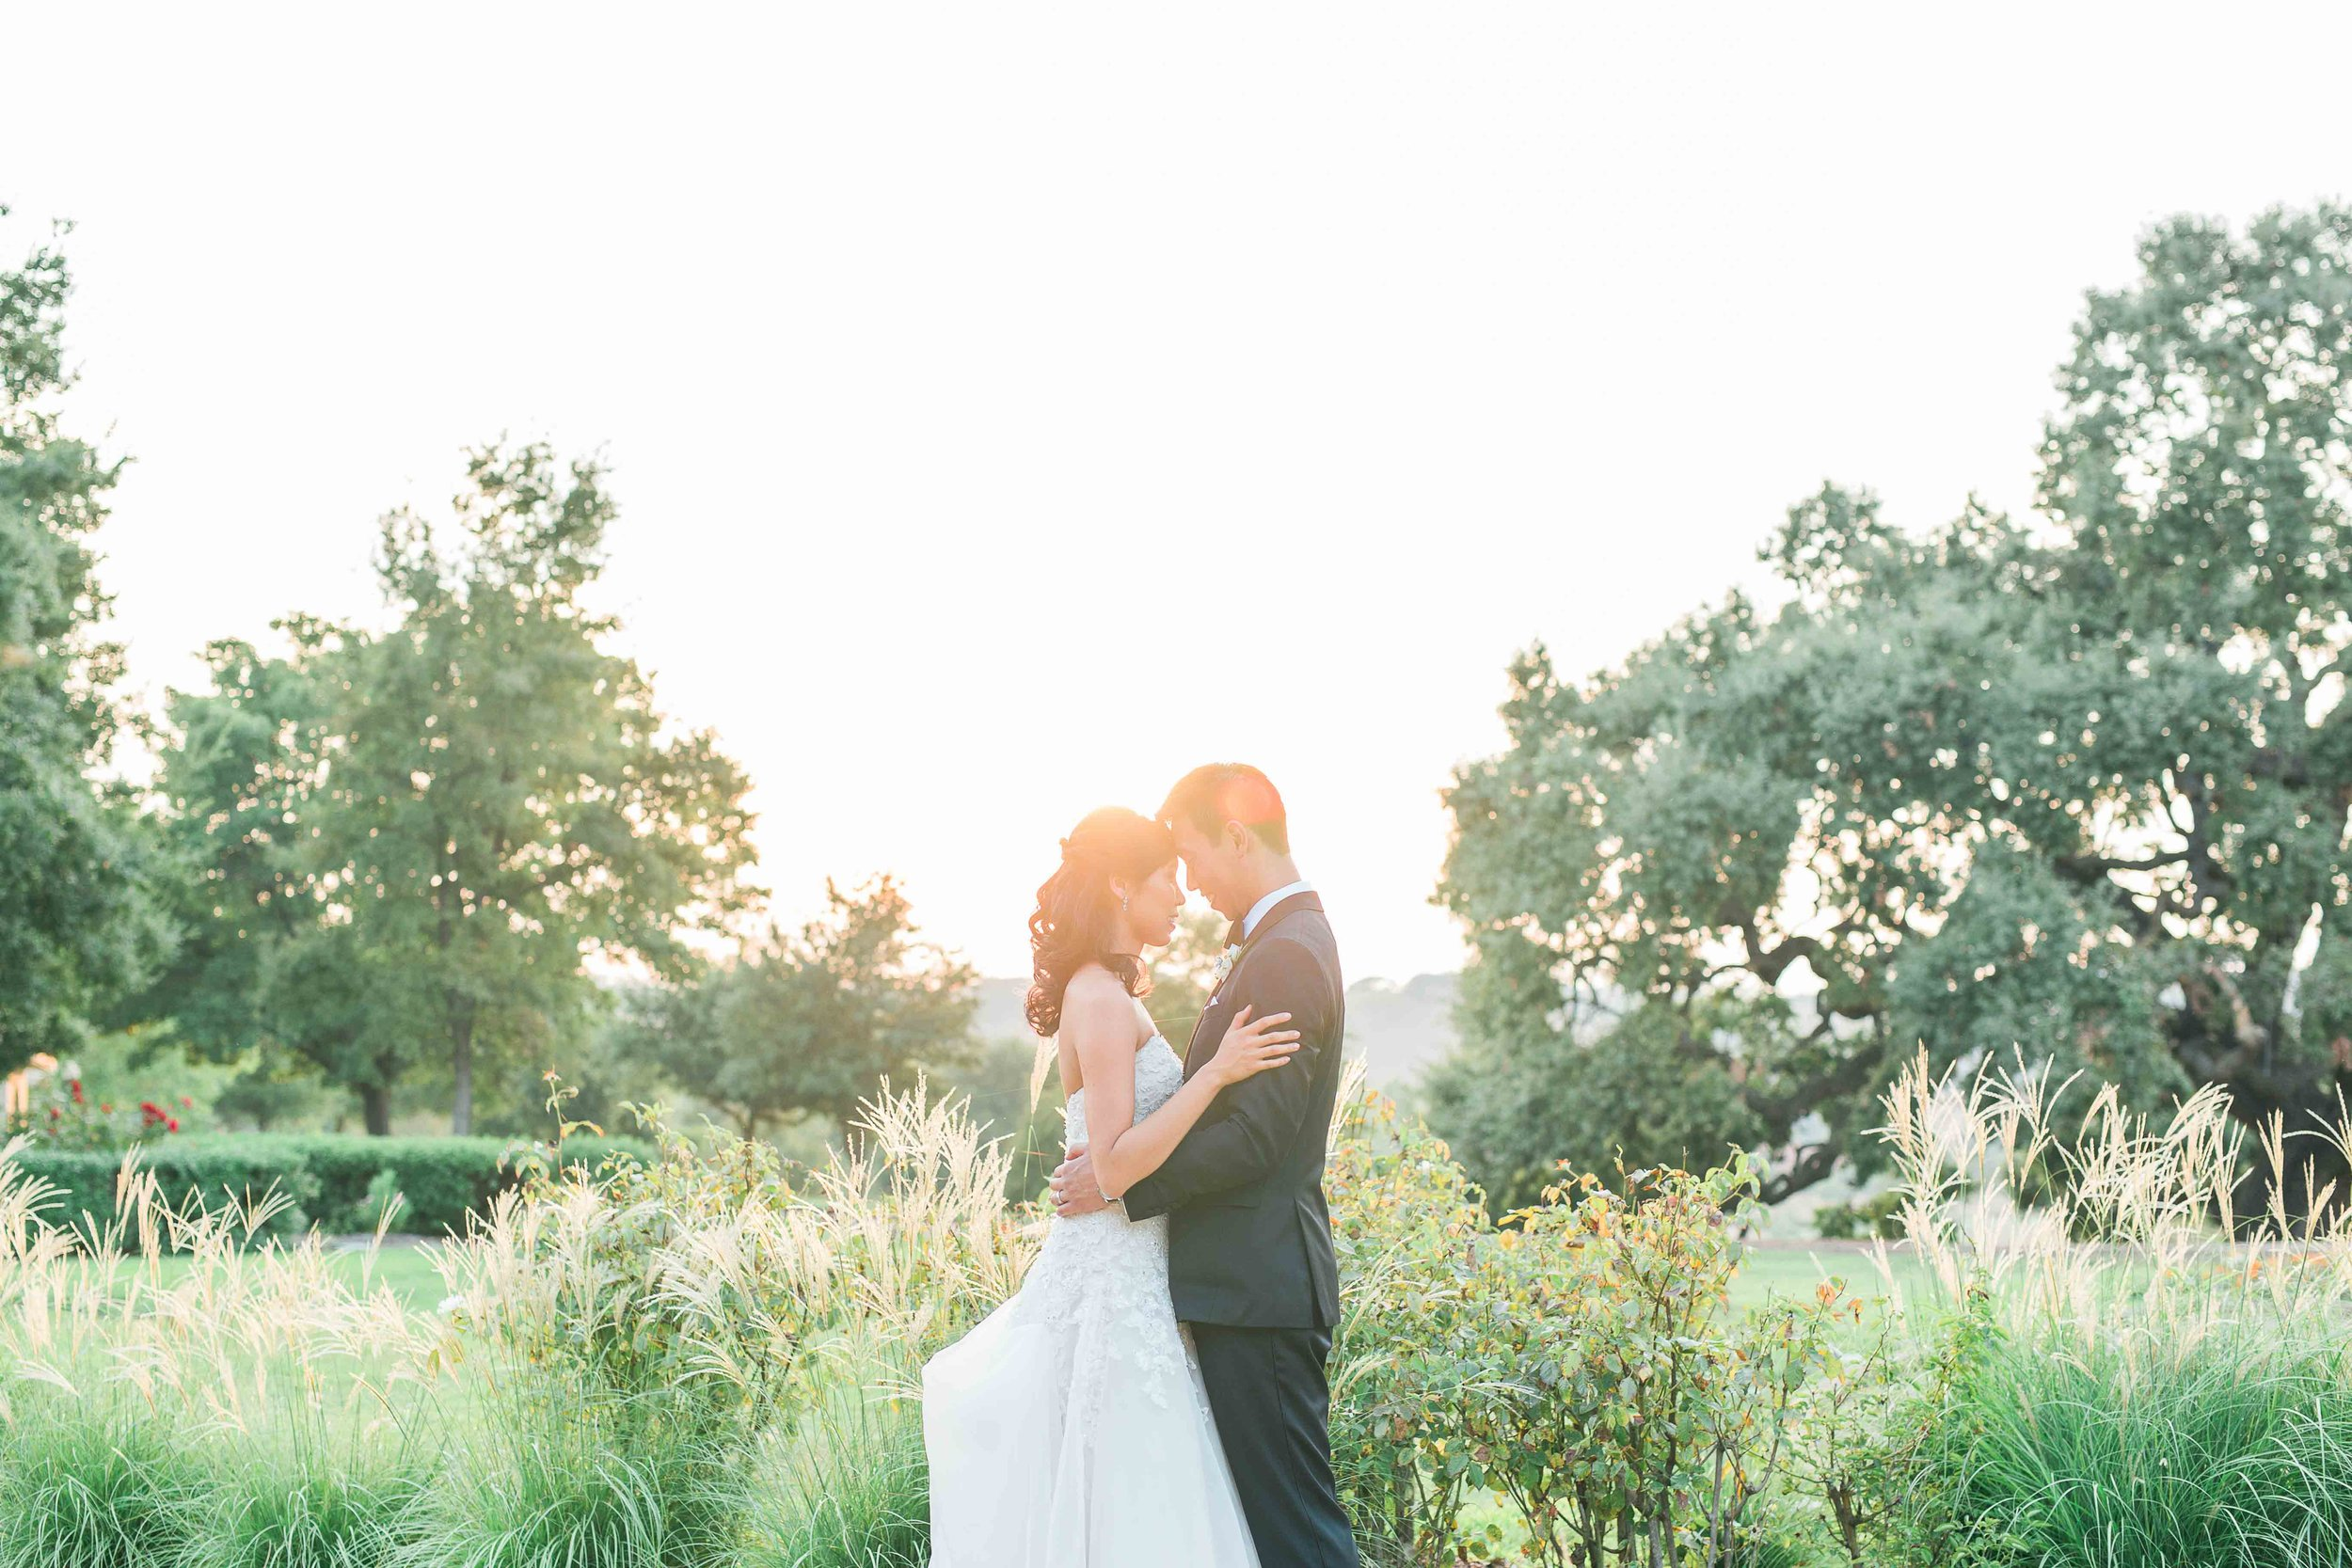 Ruby Hill Wedding Photos by JBJ Pictures - San Francisco Wedding Photographer - Pleasanton Wedding Venue (44).jpg